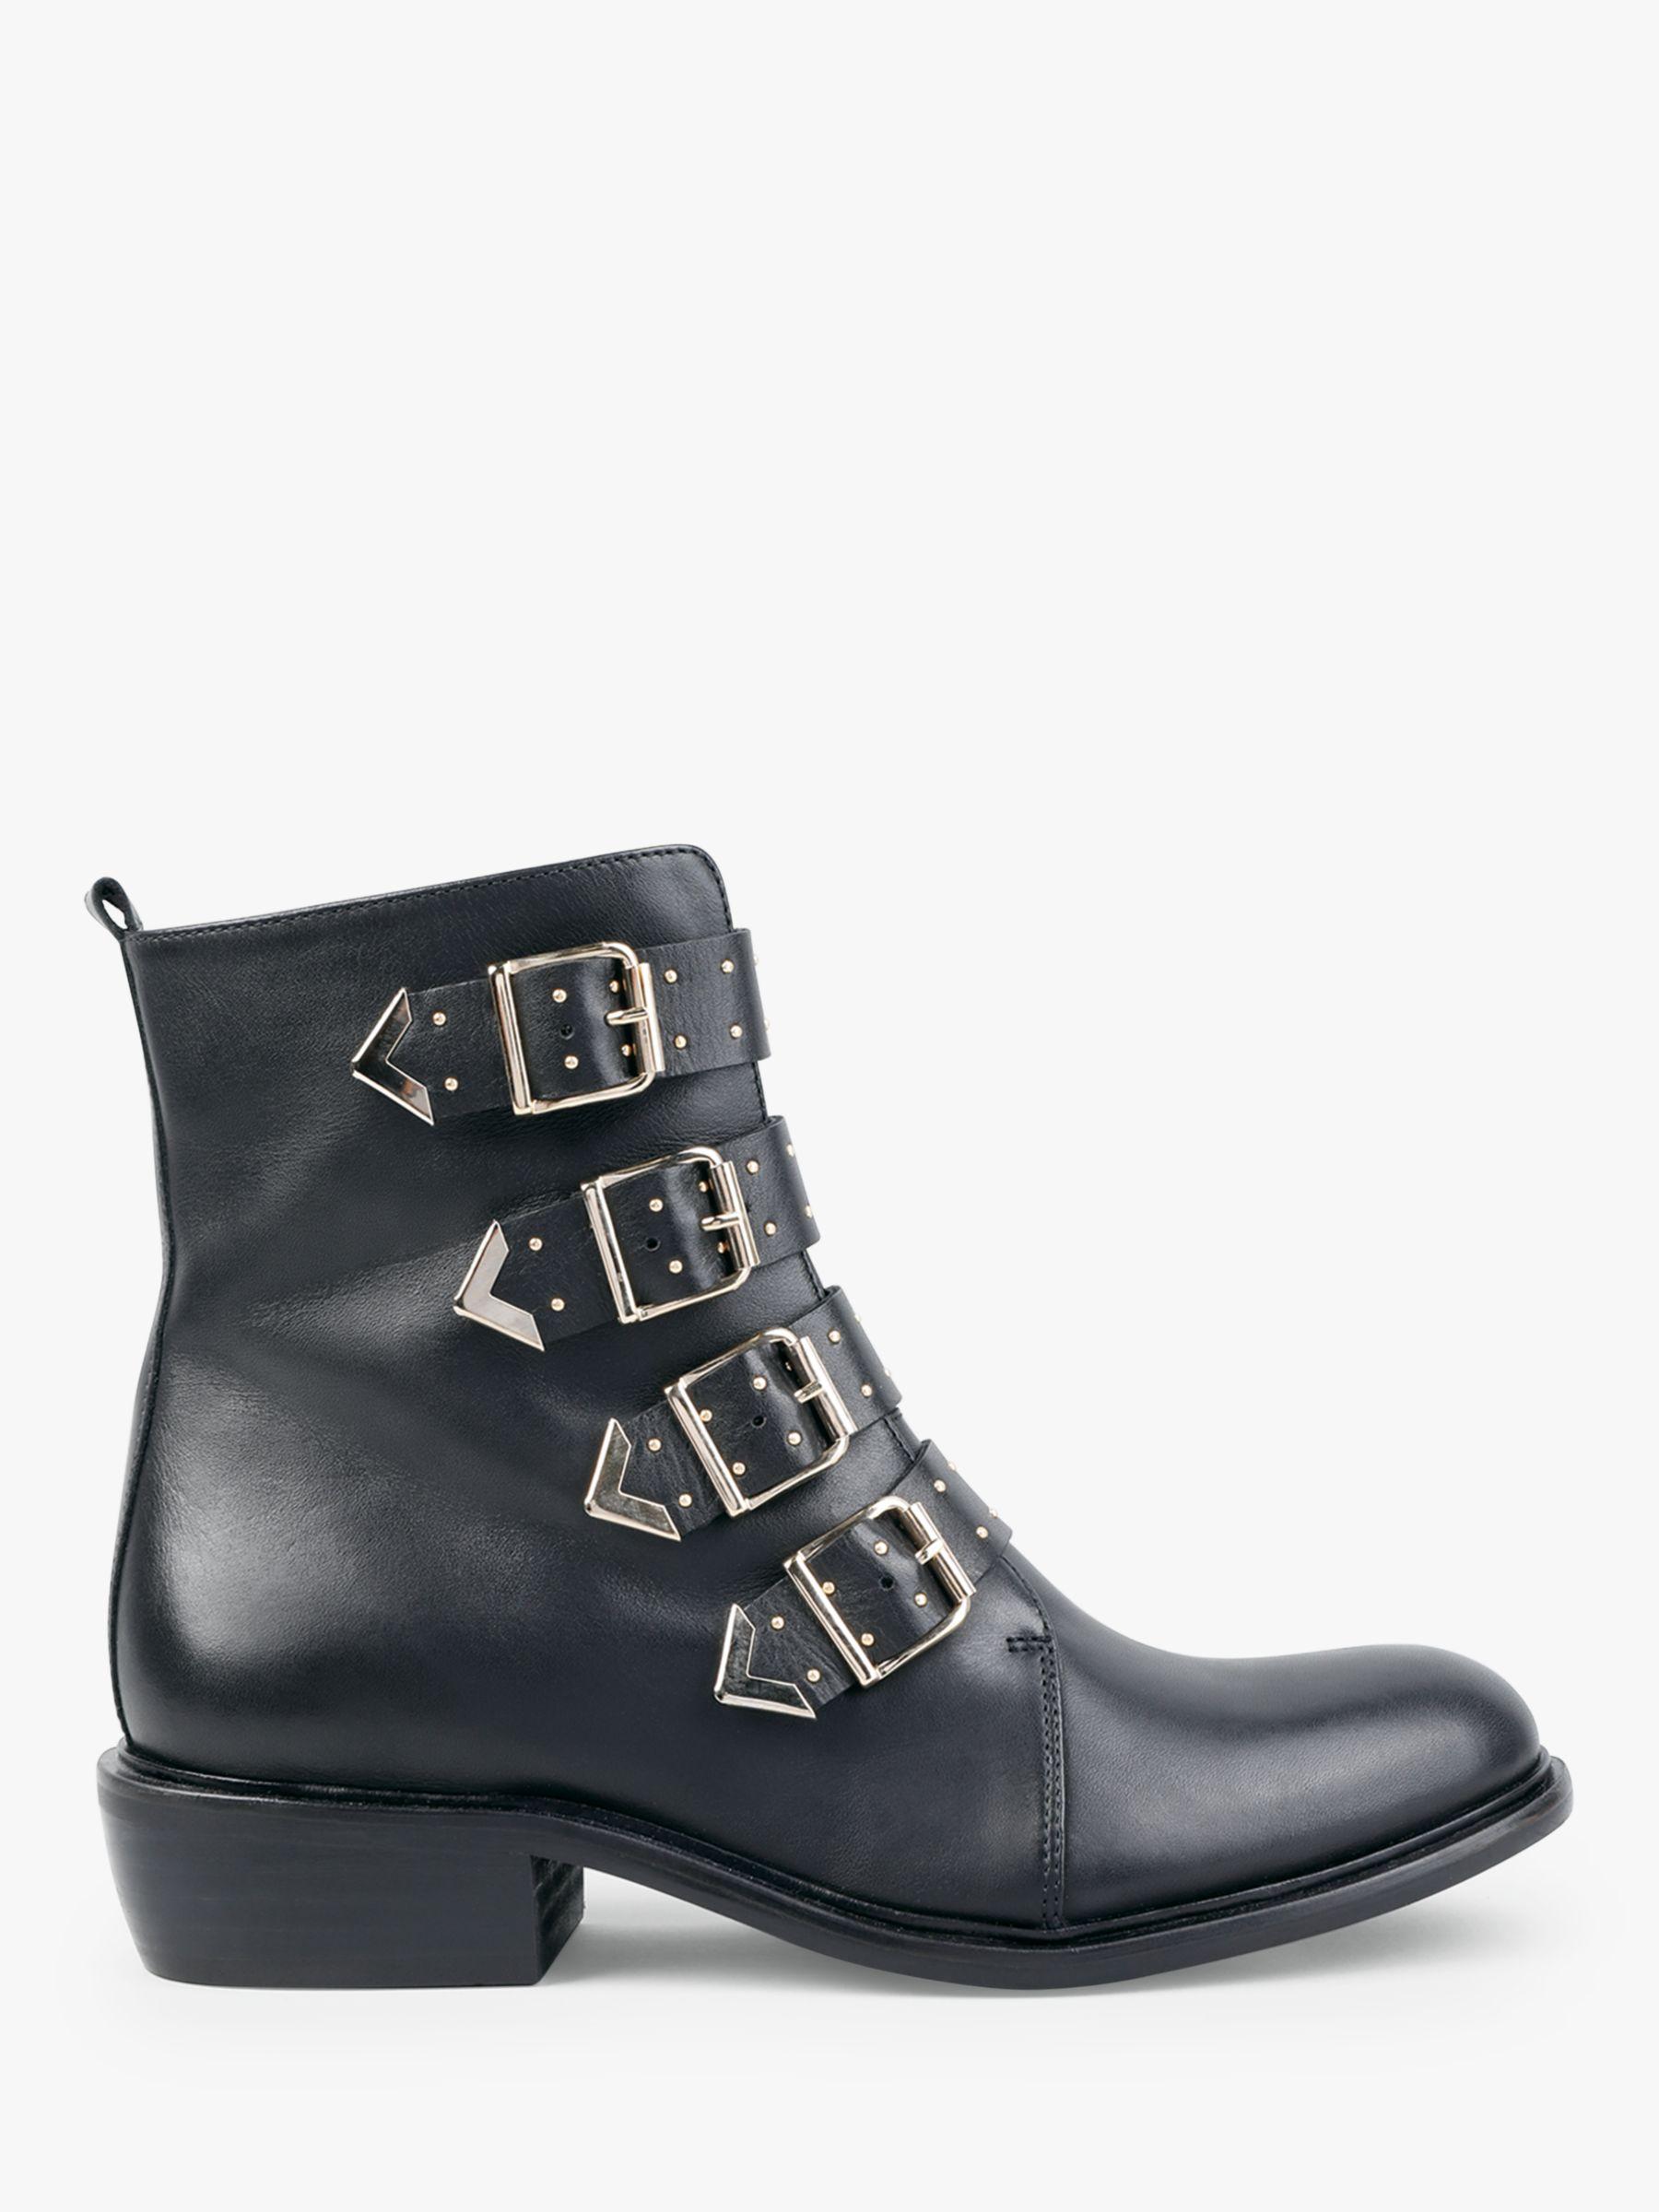 1d54e1b27e1 hush Roslin Leather Biker Ankle Boots, Black/Gold